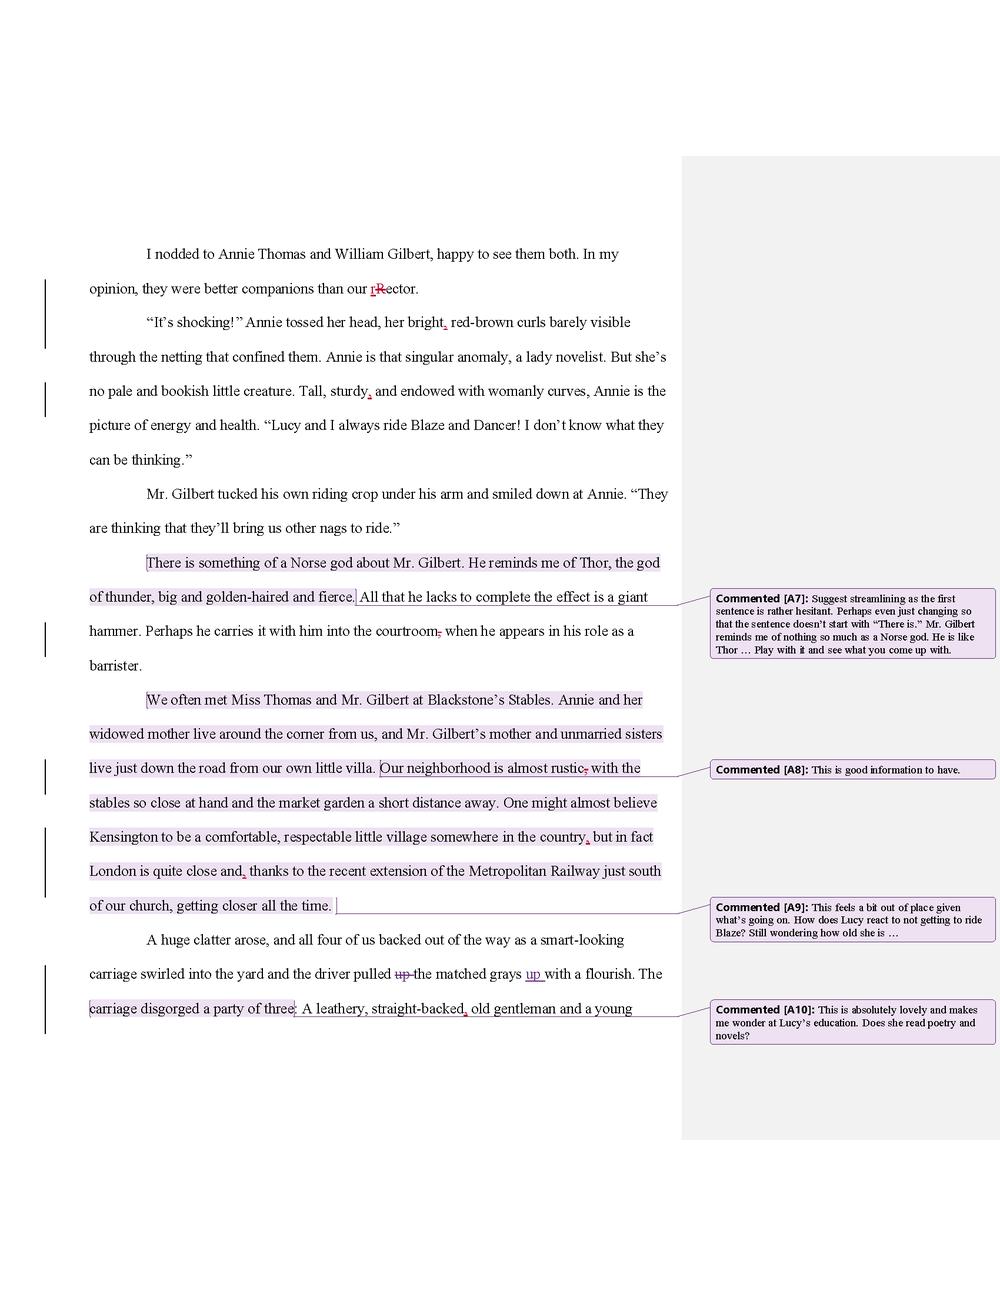 56-MysteryatBlackstoneStables-1_Page_3.png